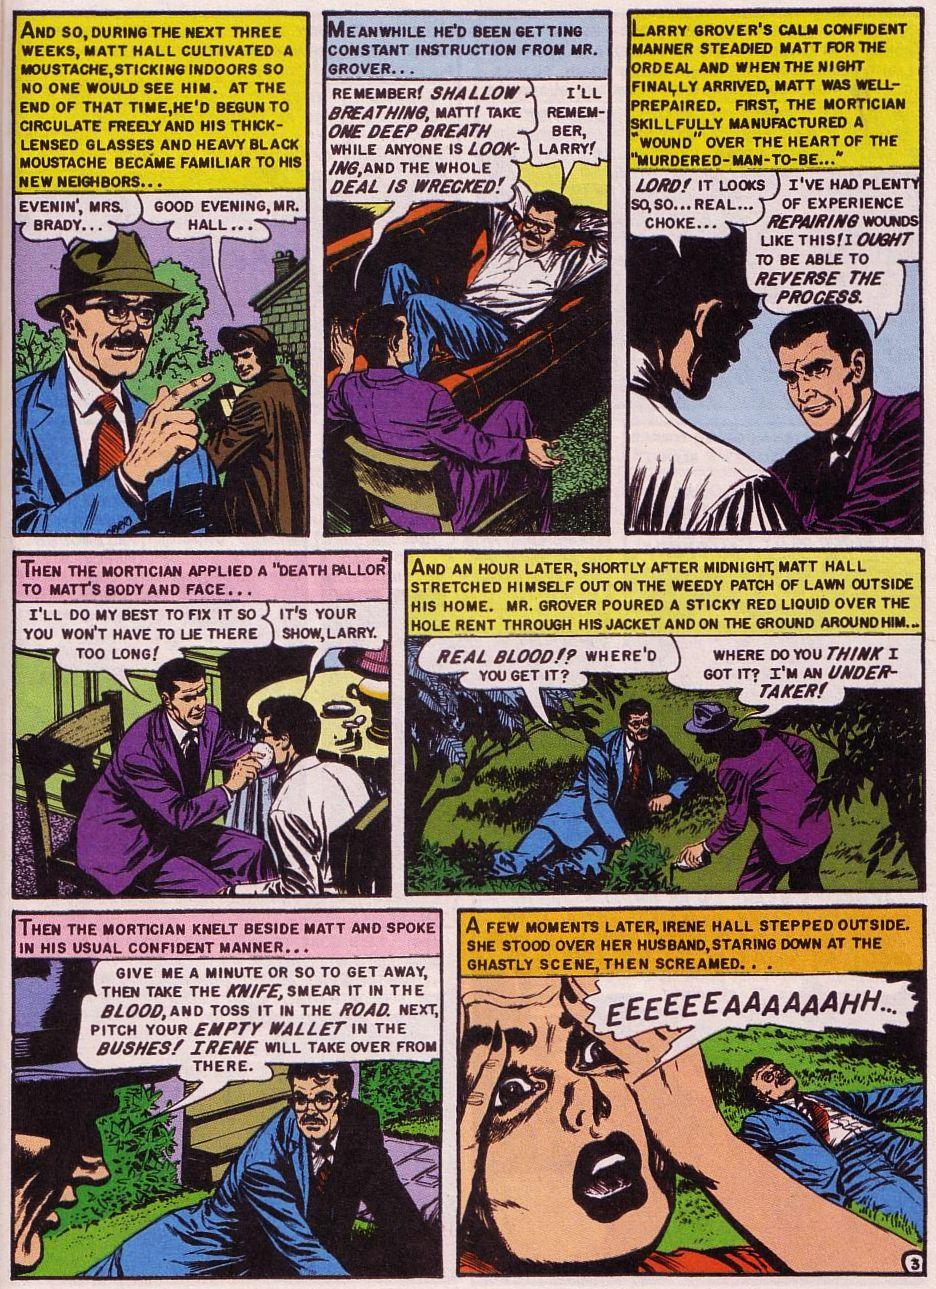 Read online Shock SuspenStories comic -  Issue #18 - 10